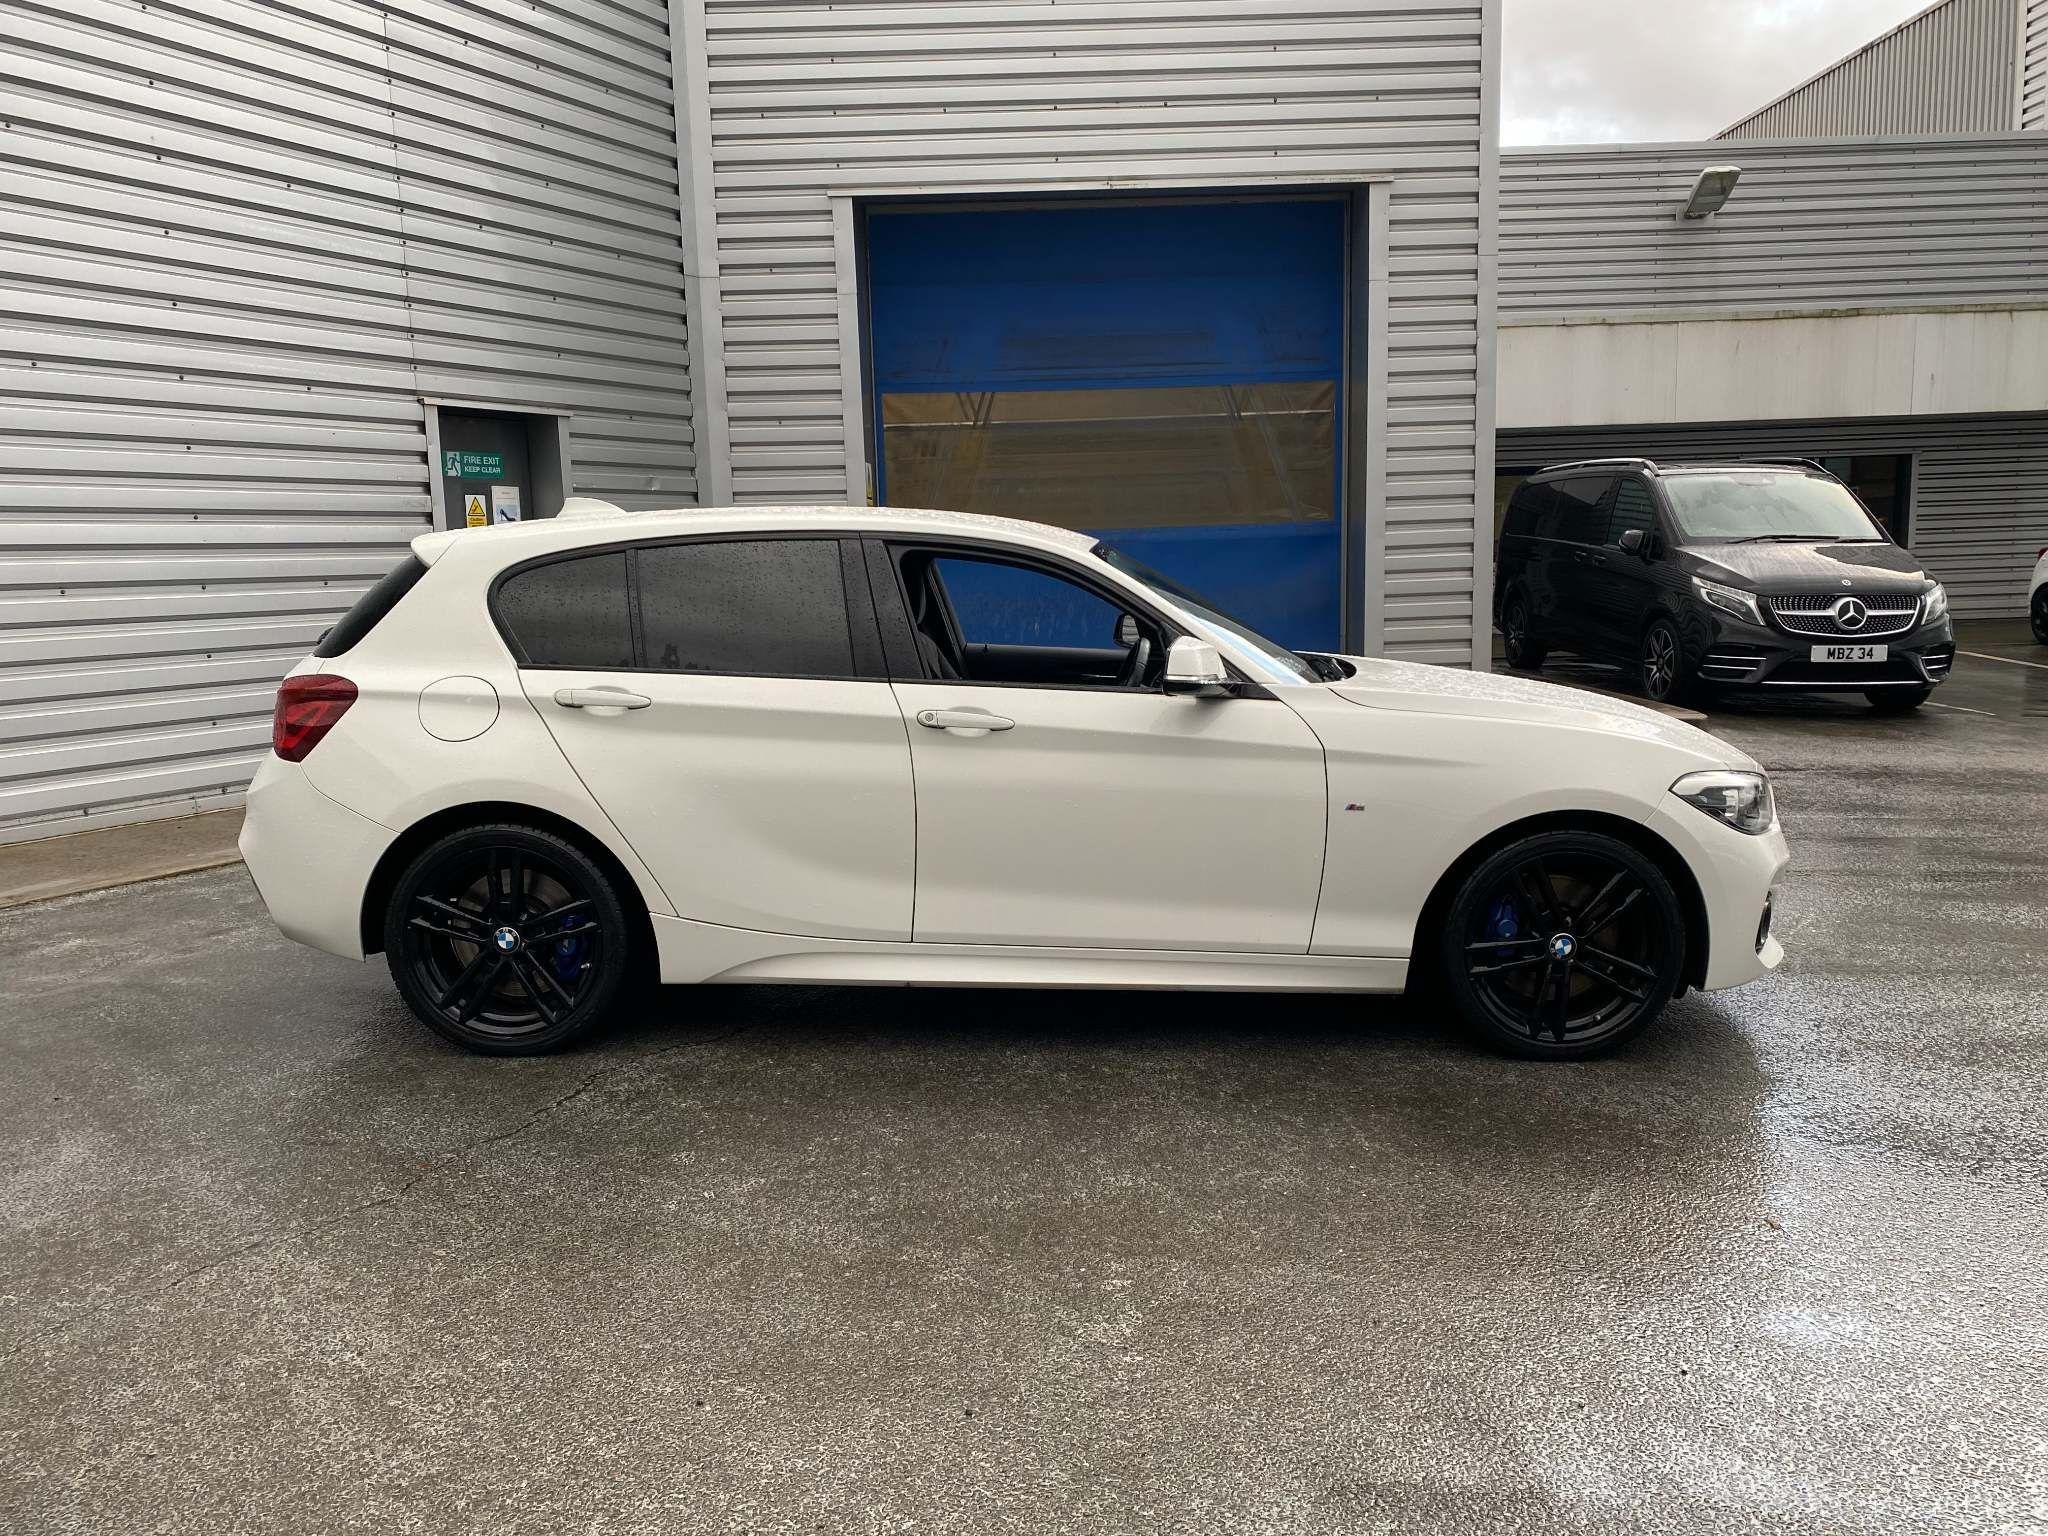 Image 3 - BMW 120d M Sport Shadow Edition 5-door (MF67SFO)